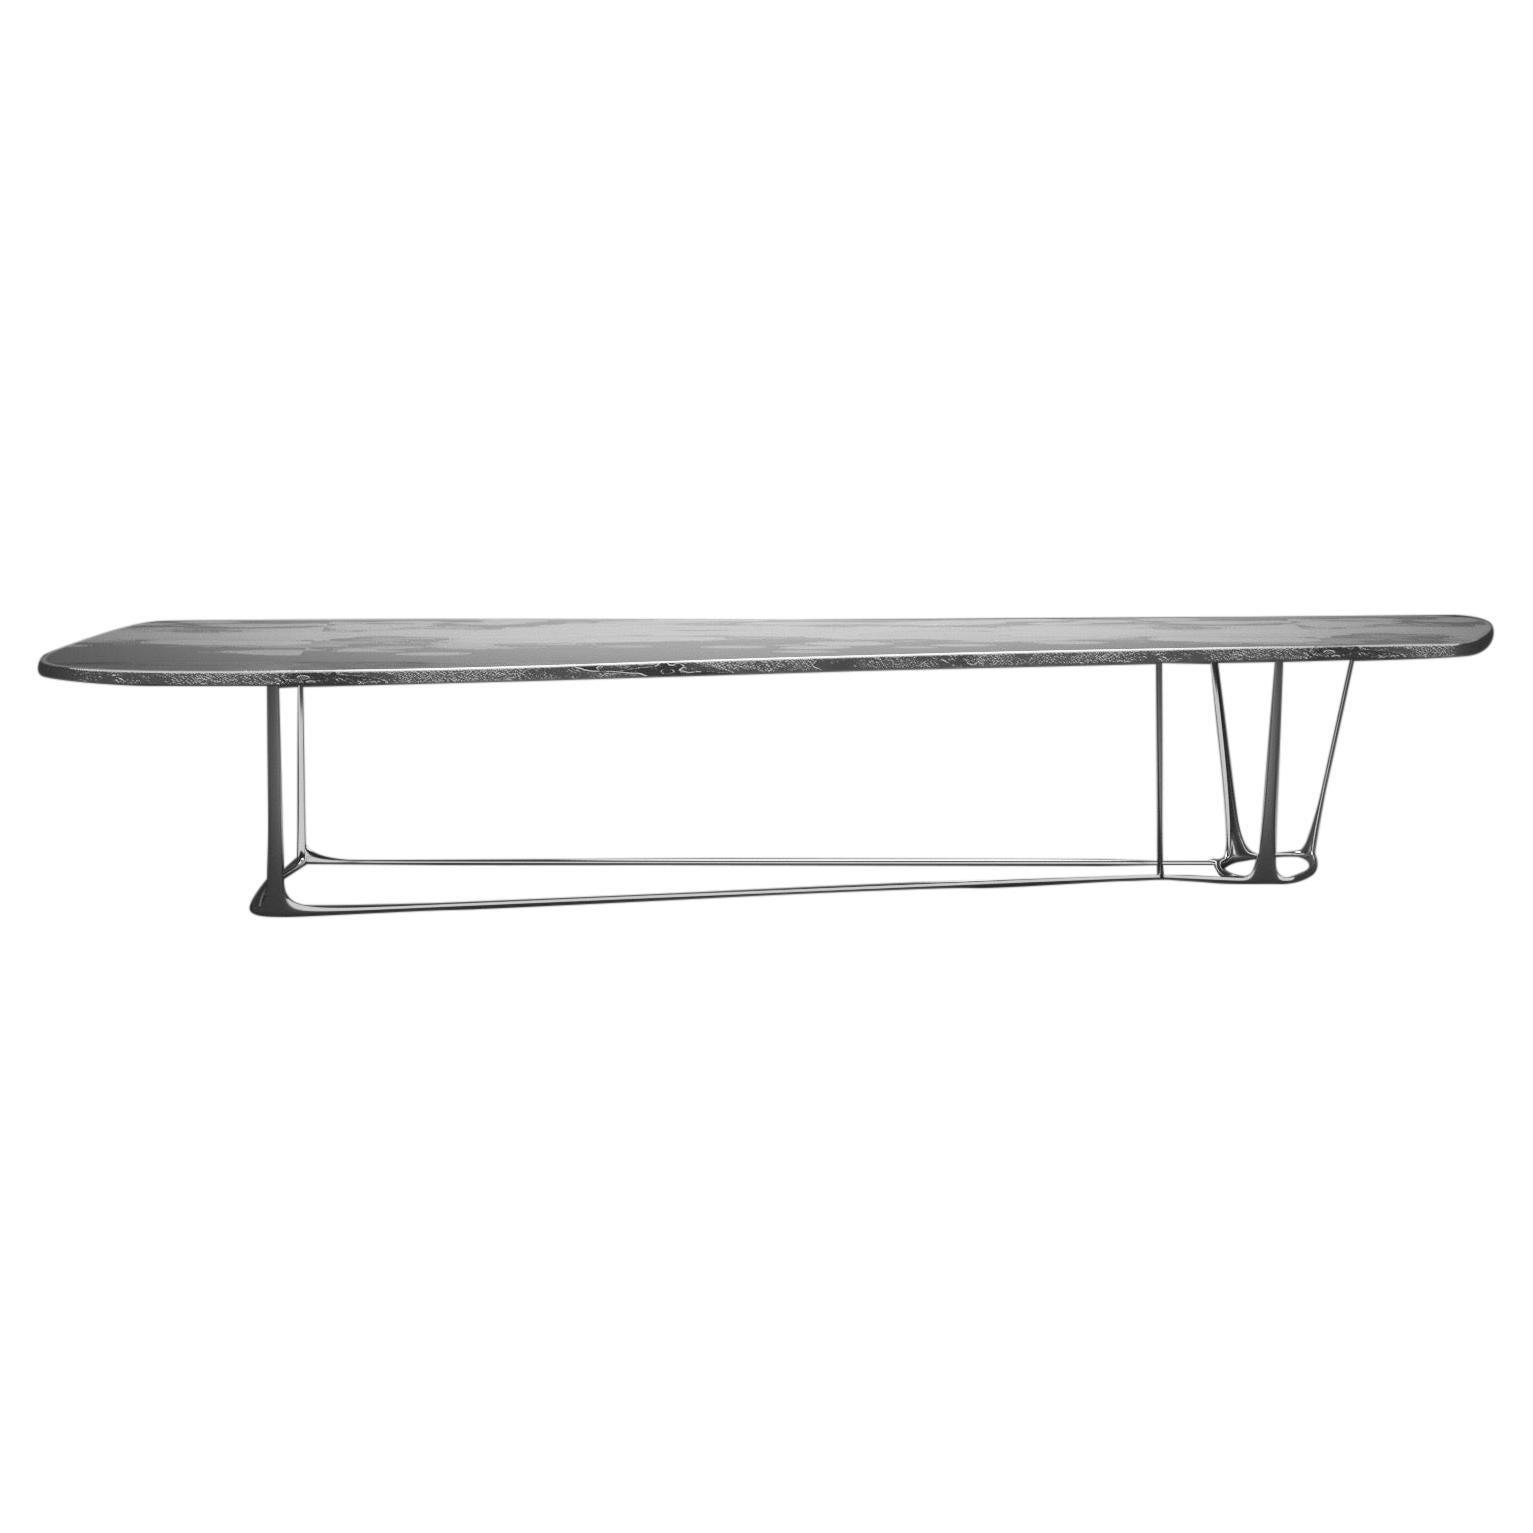 BEAM, Limited Edition 21st Century Hand Silvered Aluminium & Steel Dining Table